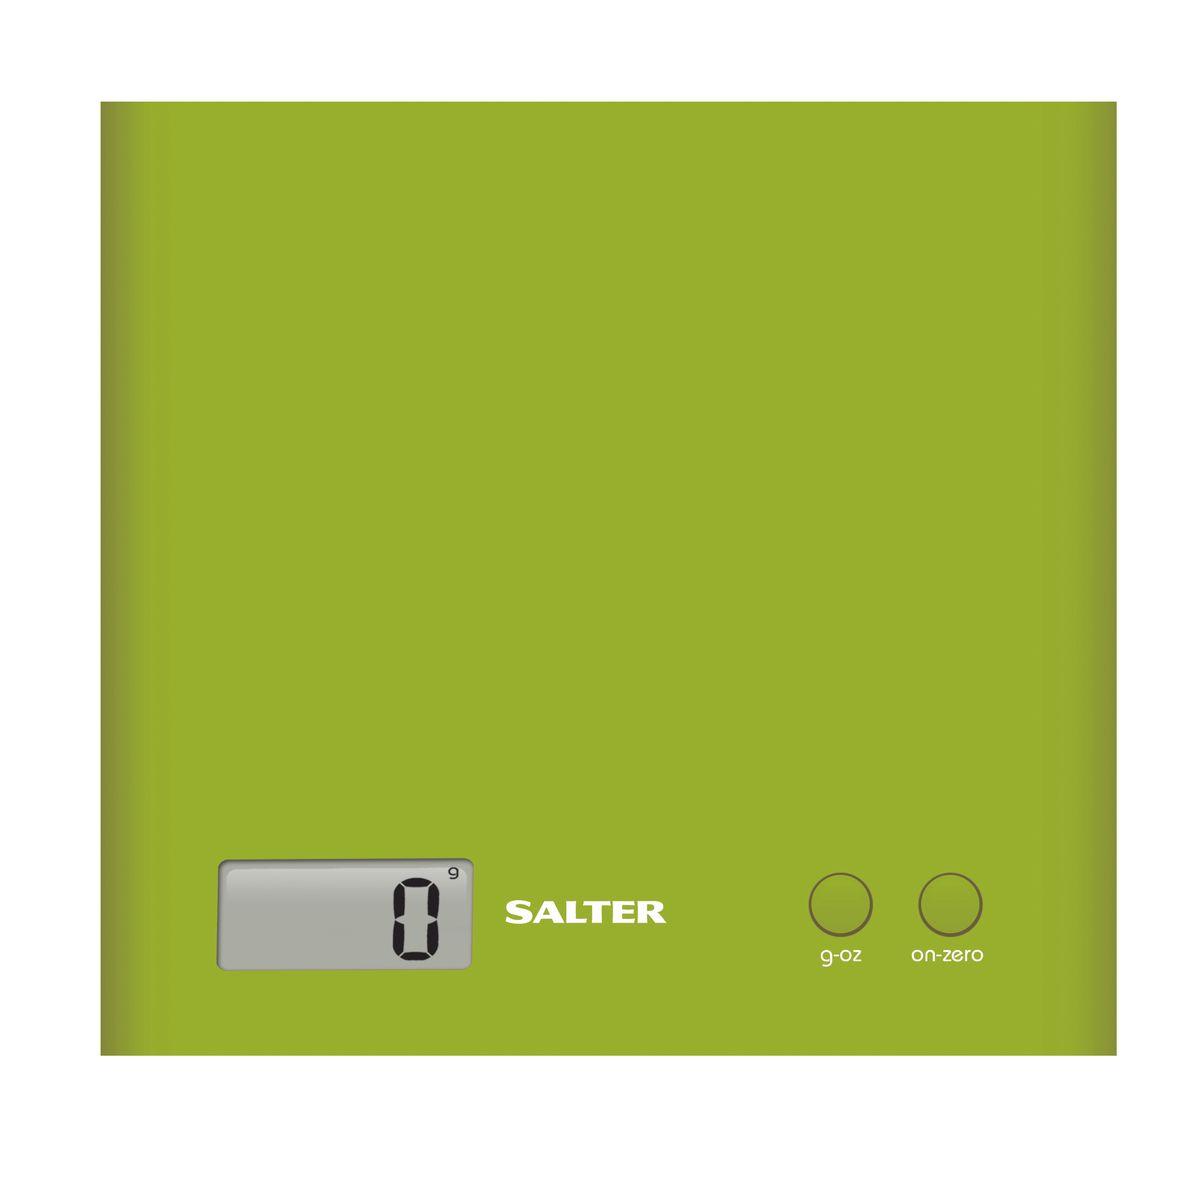 Salter 1066 GNDR кухонные весы salter 1066 ogdr кухонные весы